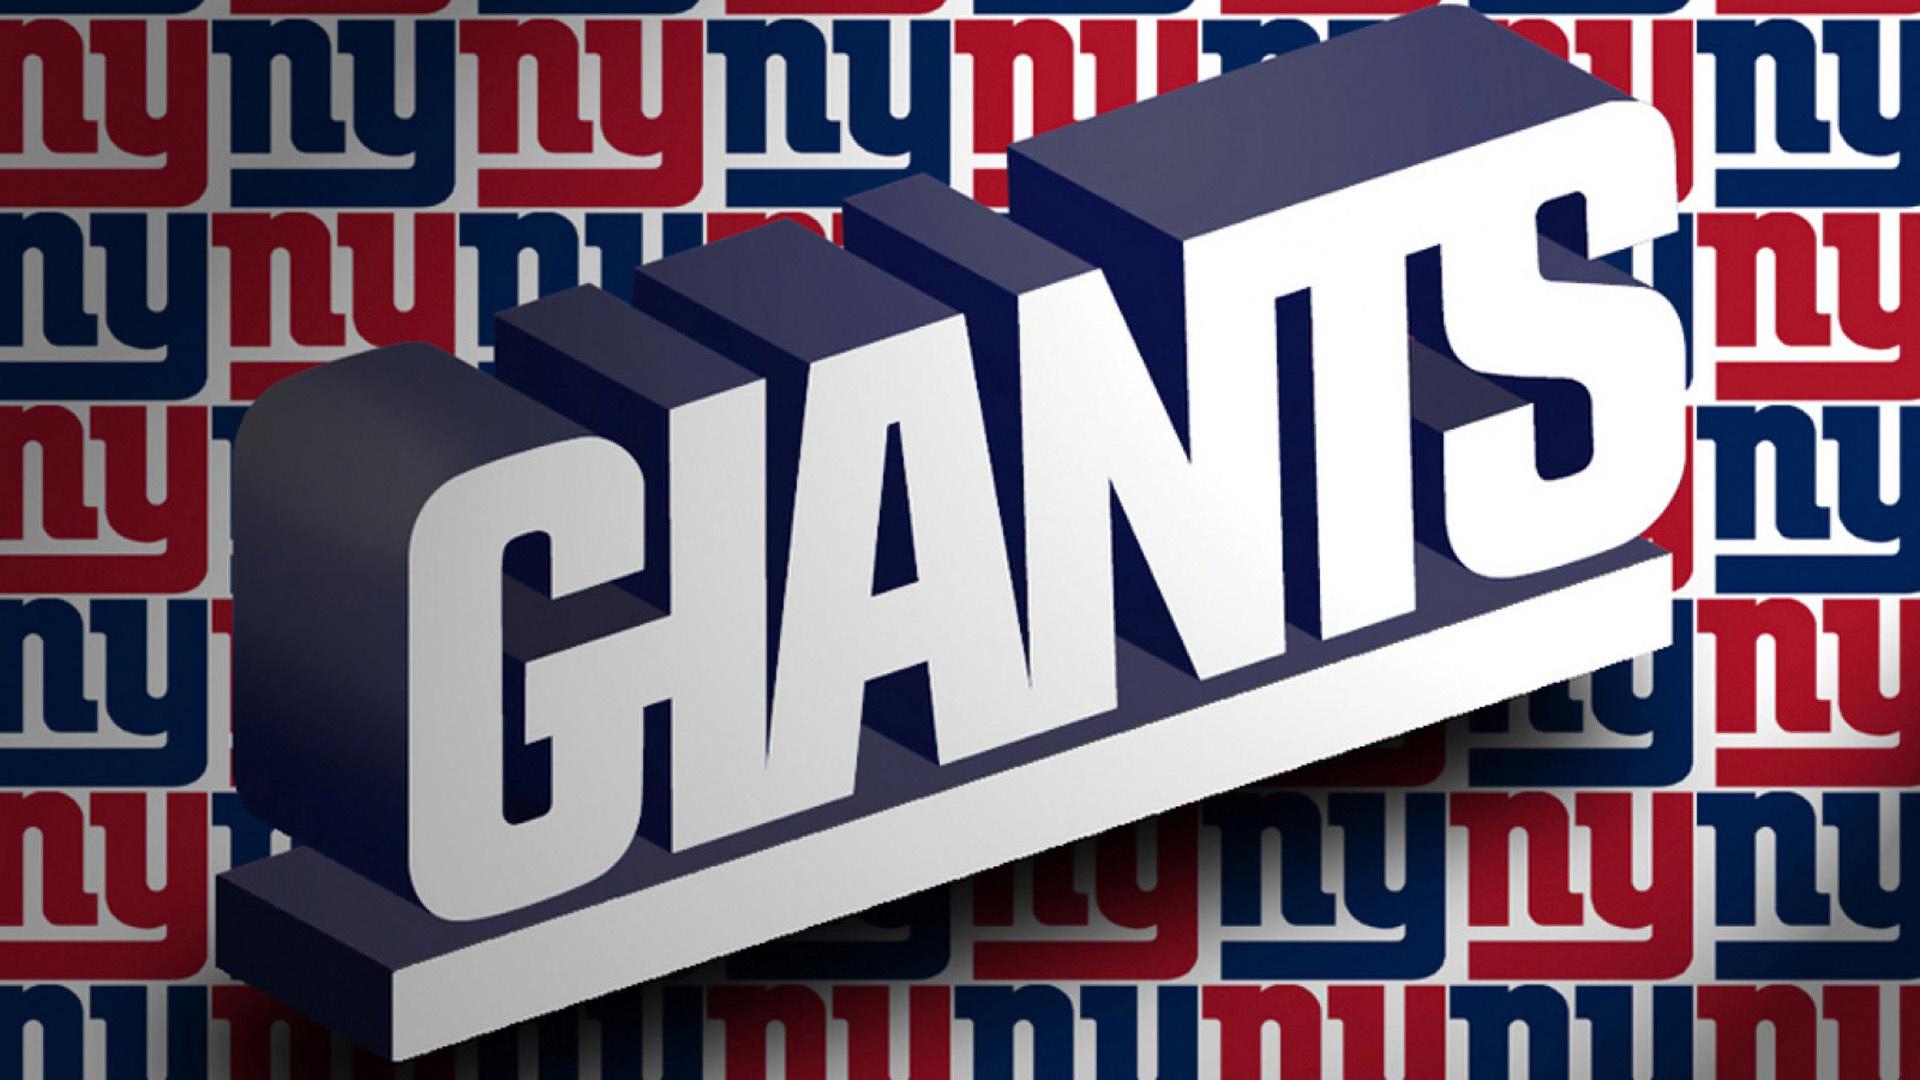 New York Giants Background